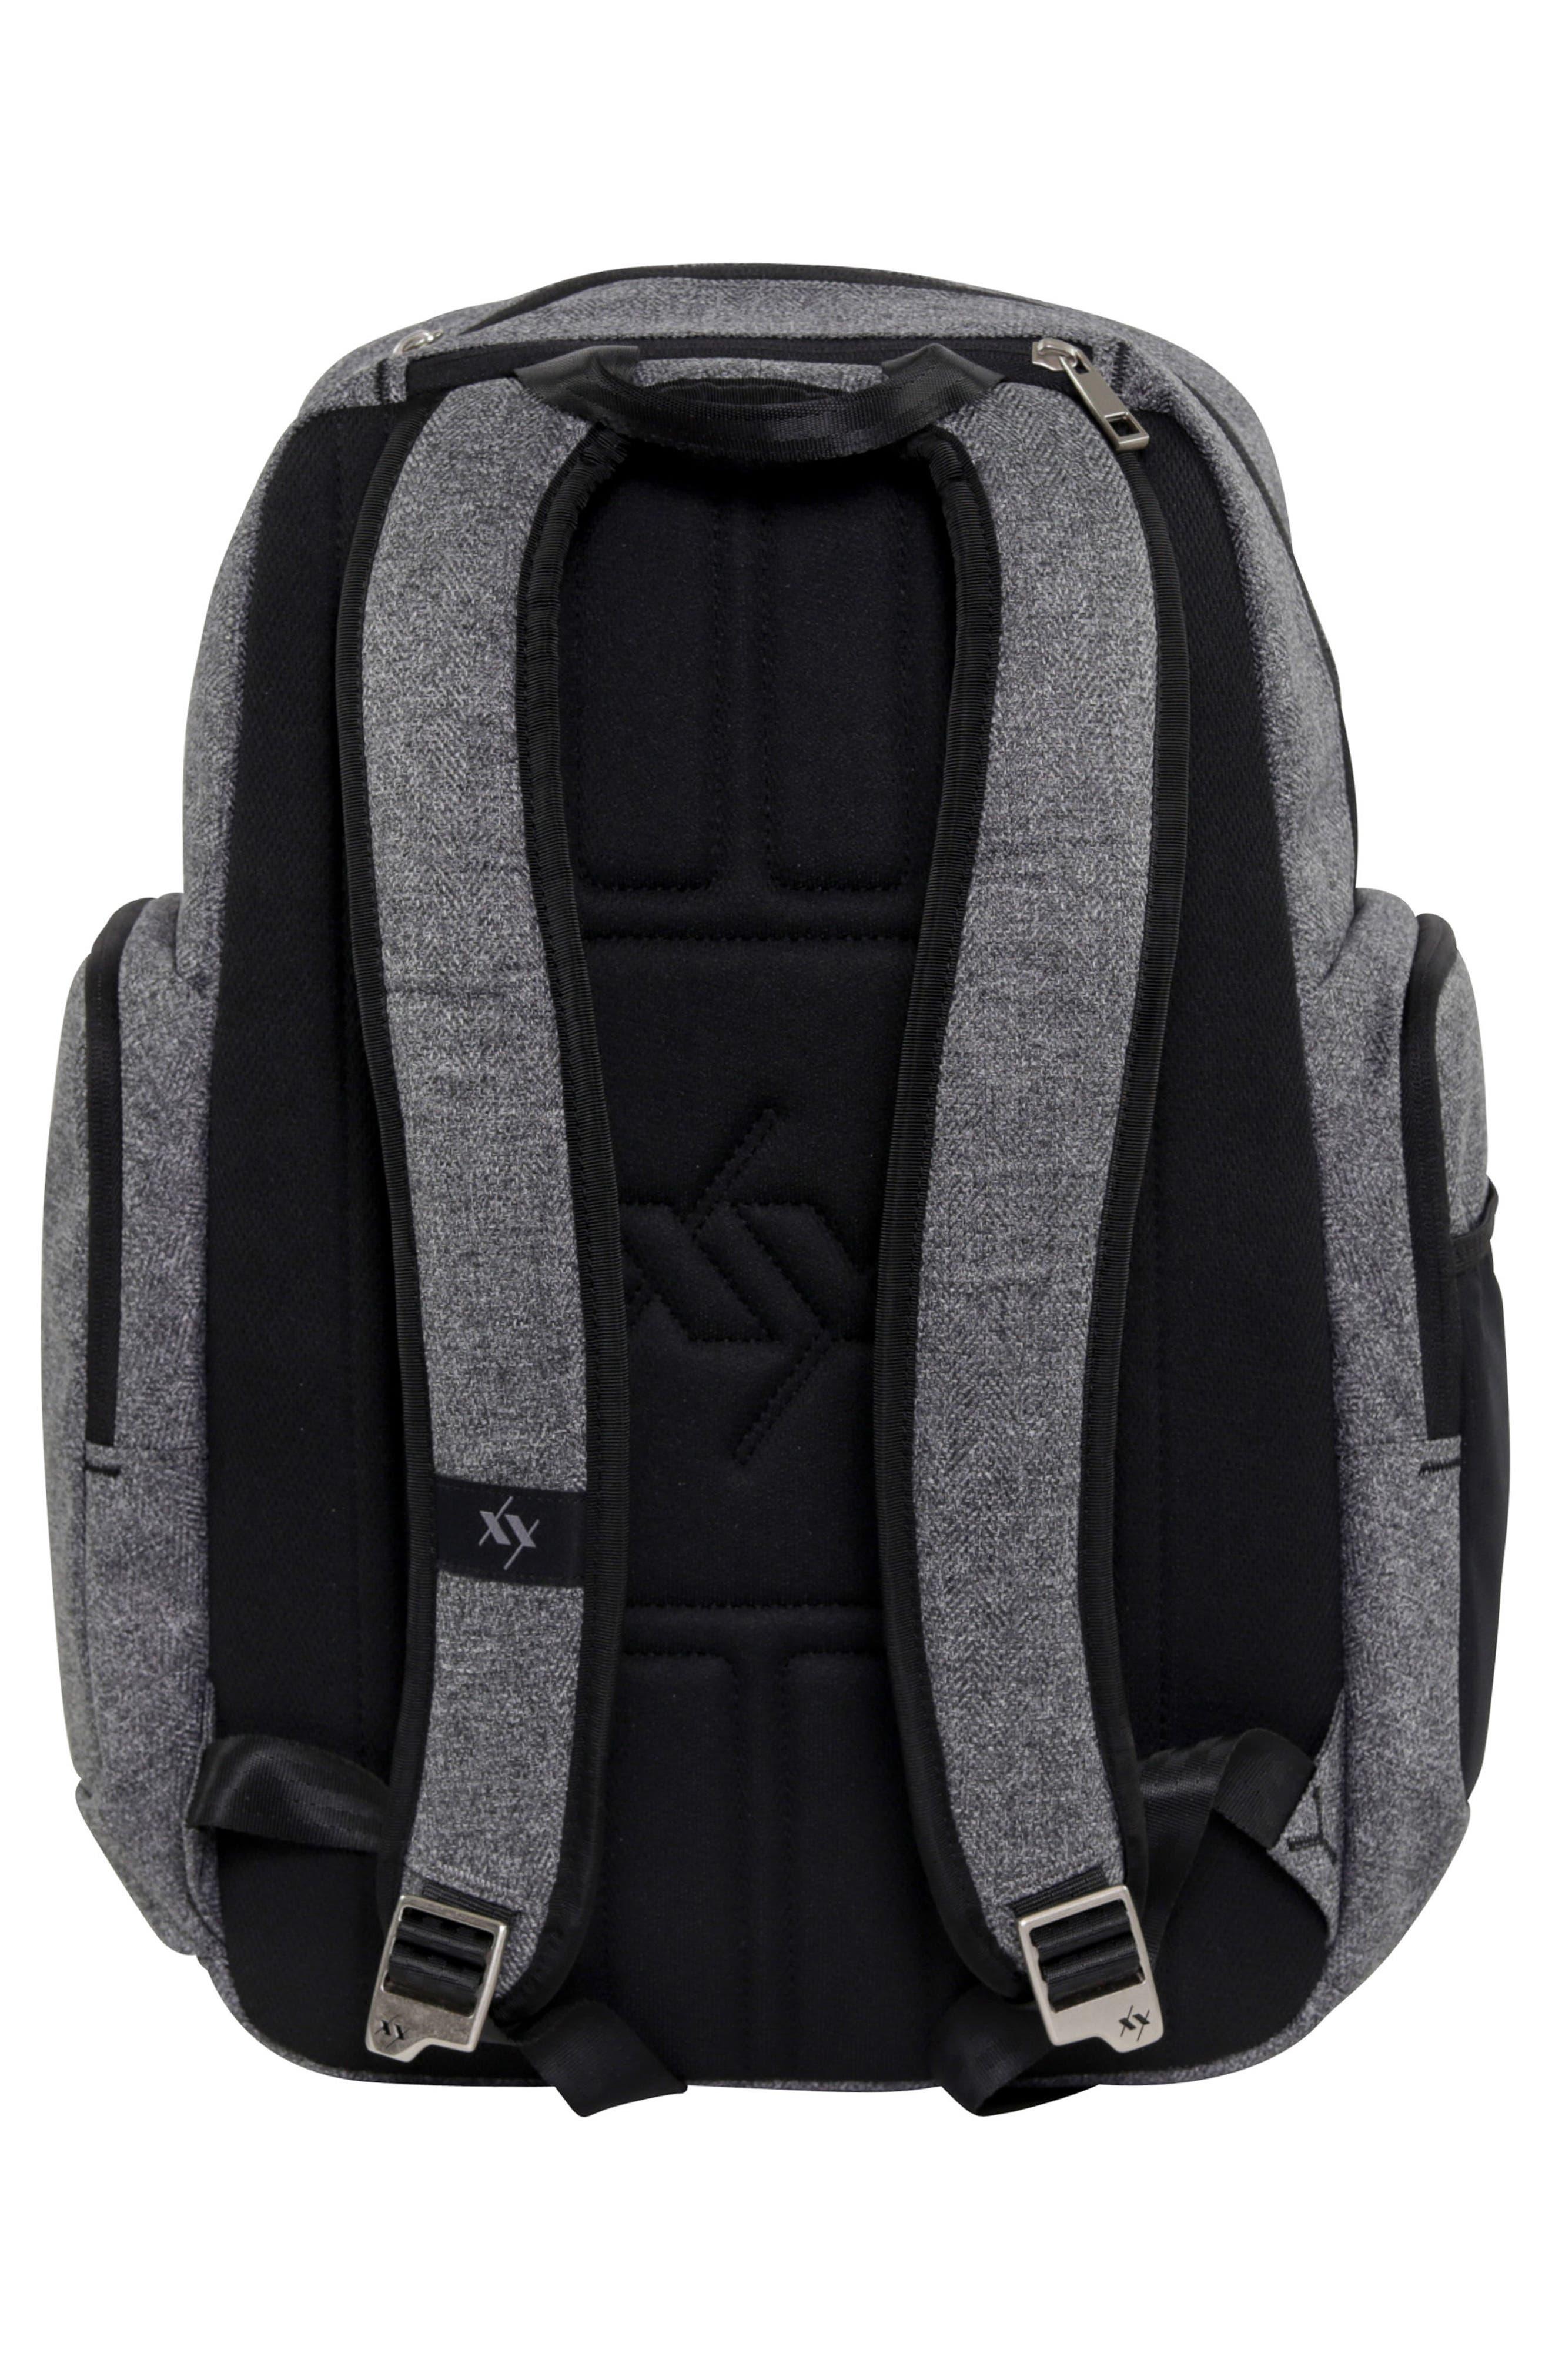 XY Vector Diaper Backpack,                             Alternate thumbnail 2, color,                             GRAY MATTER